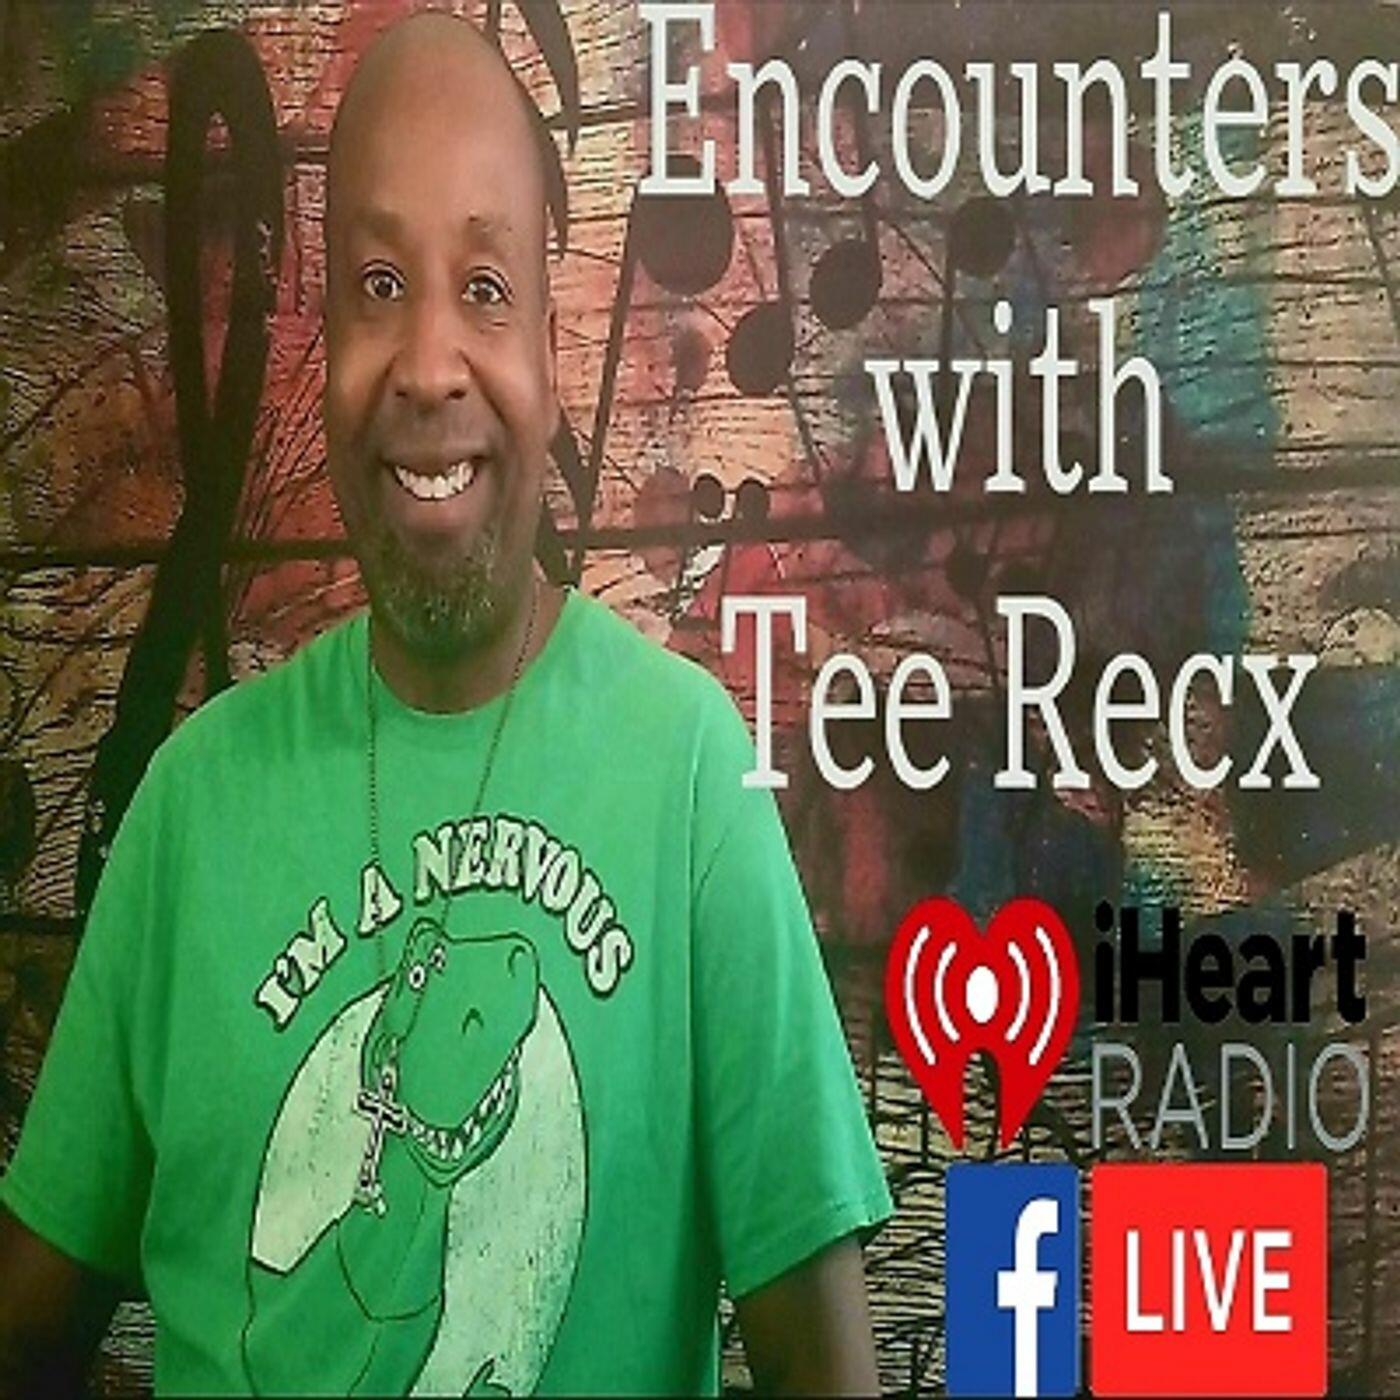 Encounters with Tee Recx